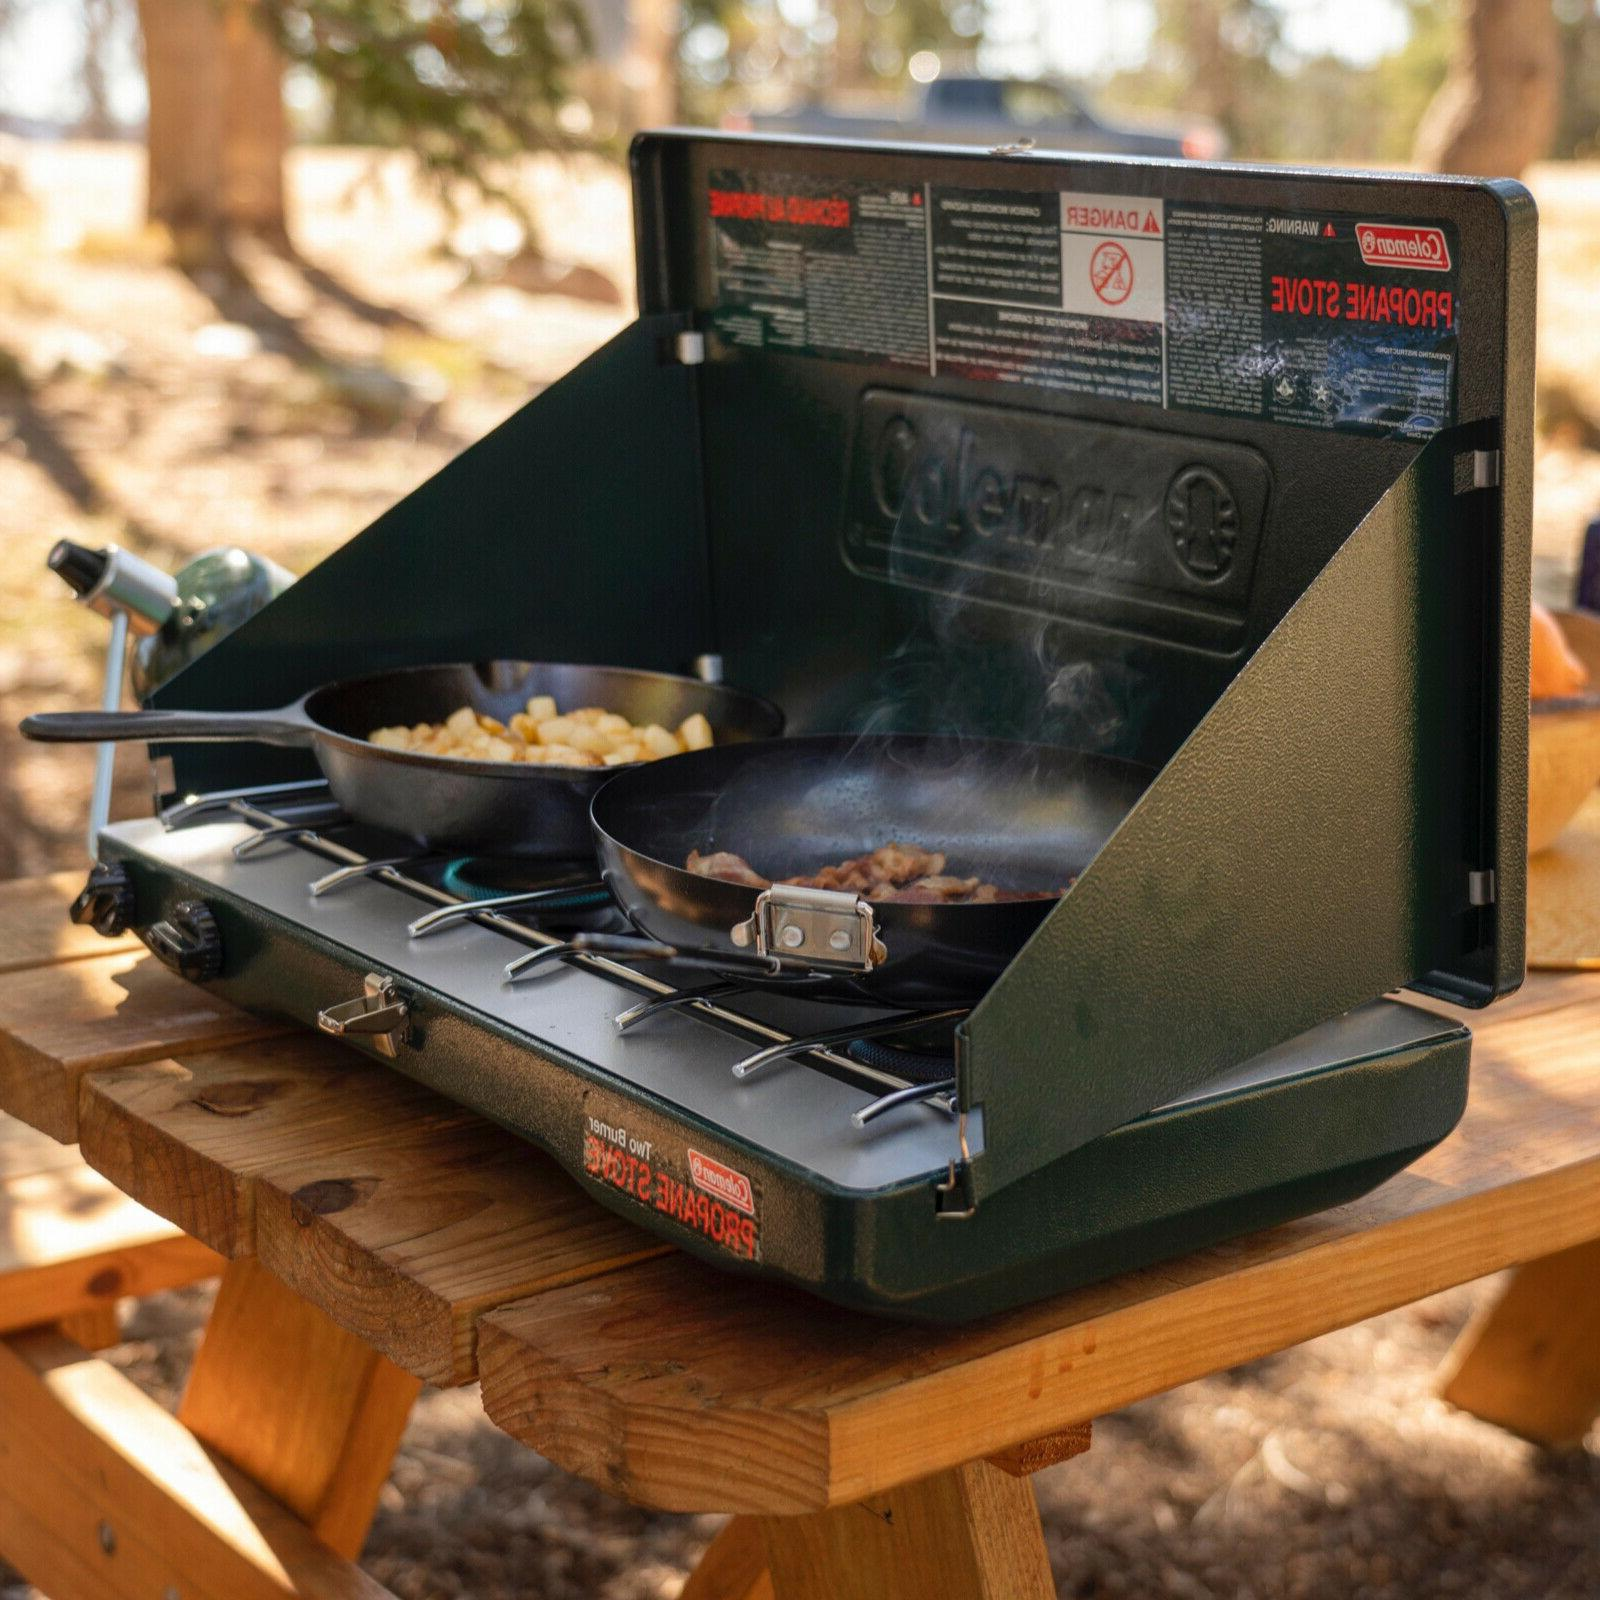 CAMP Burner Portable Cooking Gas